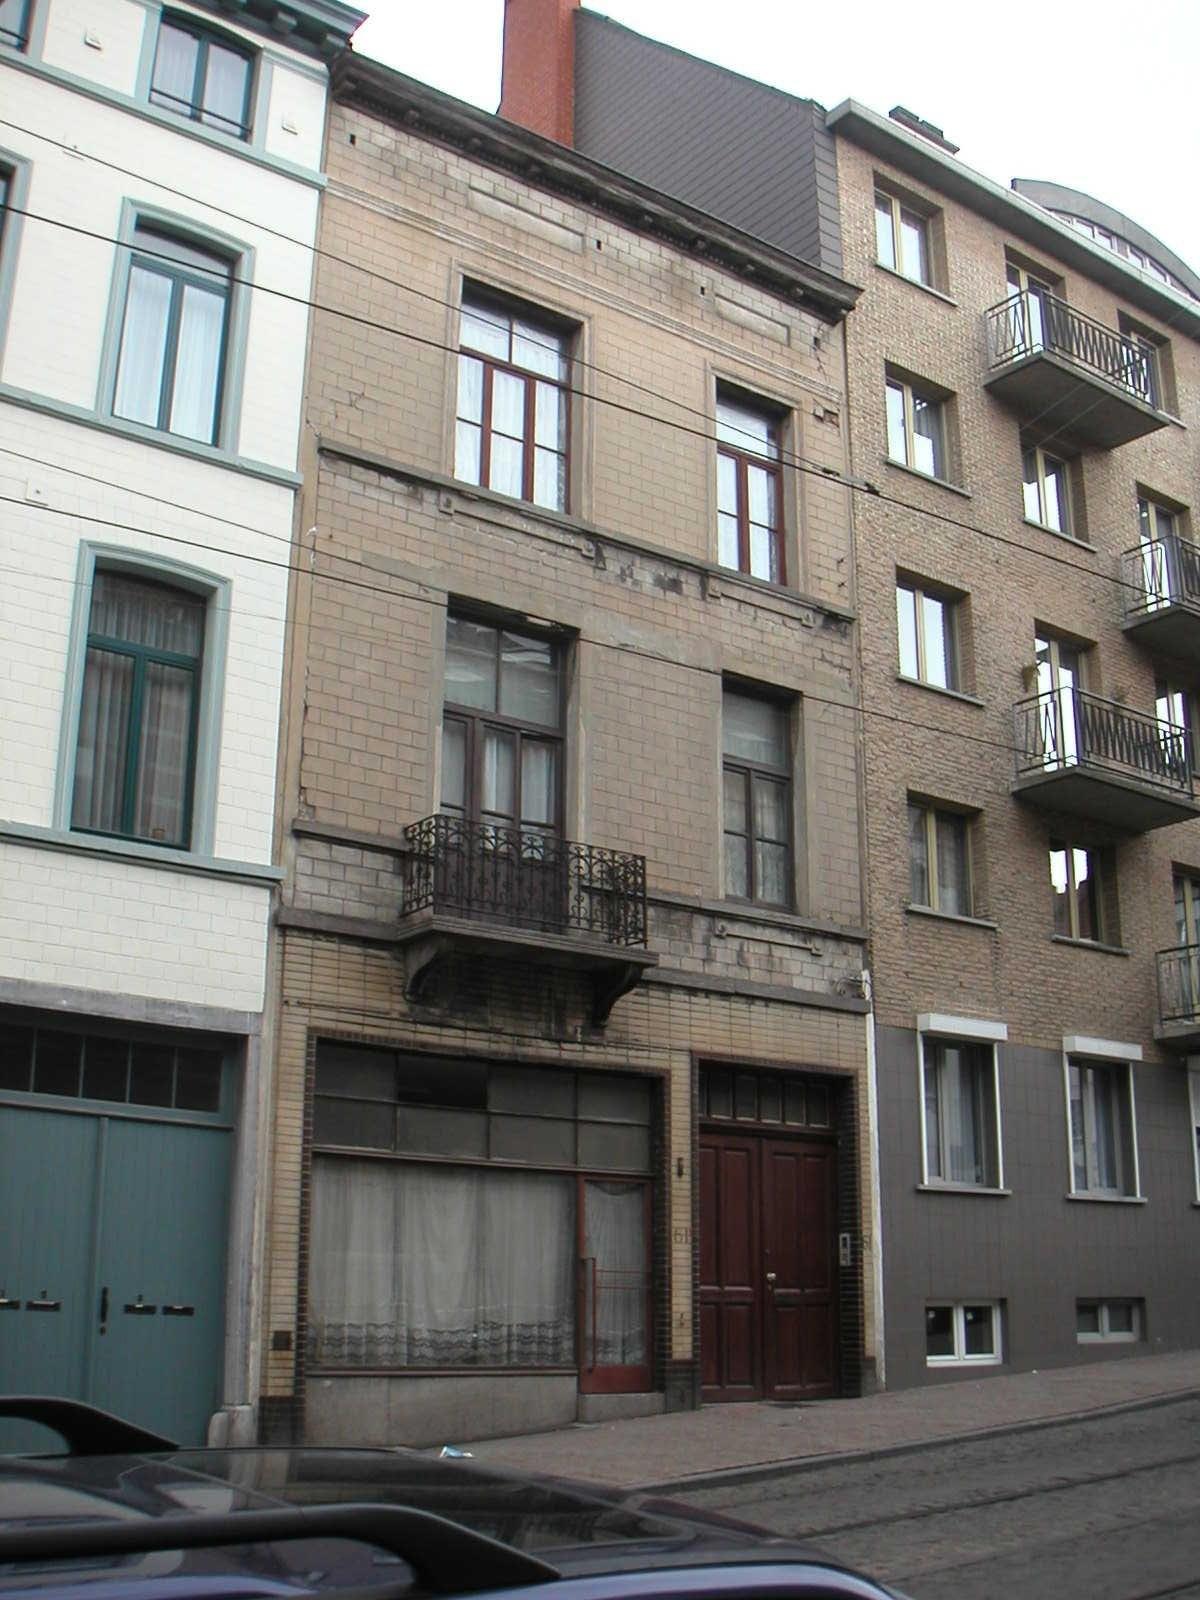 Théodore Verhaegenstraat 61-61a., 2003